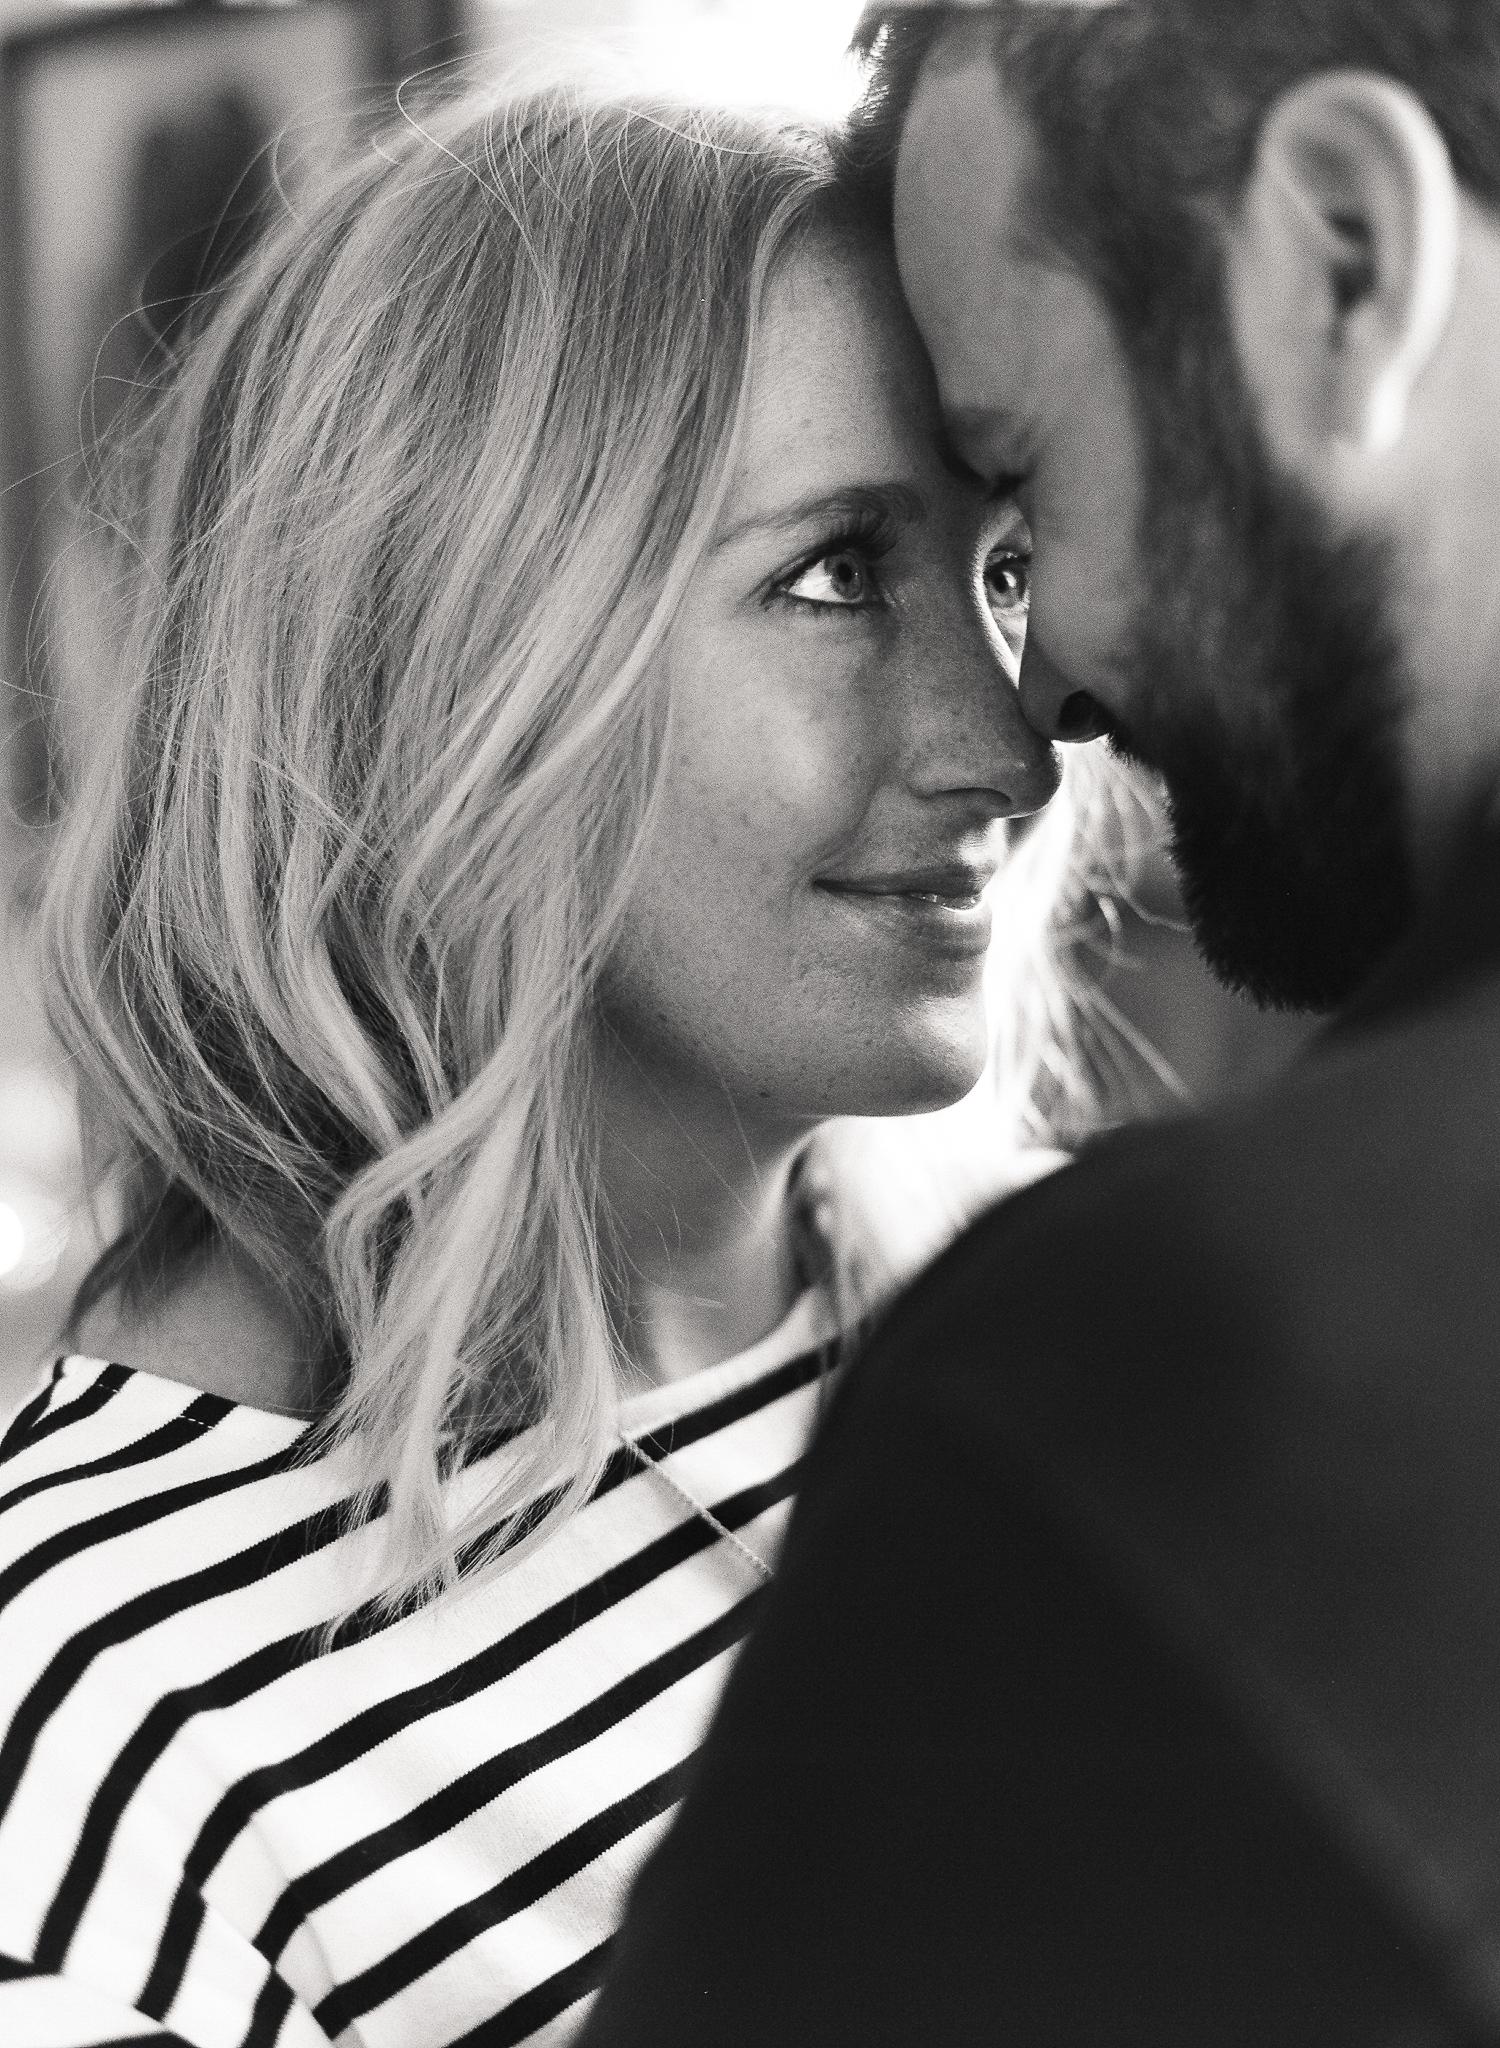 Meghan Mehan Photography - Fine Art Film Wedding Photography - San Francisco   Napa   Sonoma   Big Sur   Chicago   Minneapolis   Milwaukee   Lake Geneva   Door County   Wisconsin 042.jpg